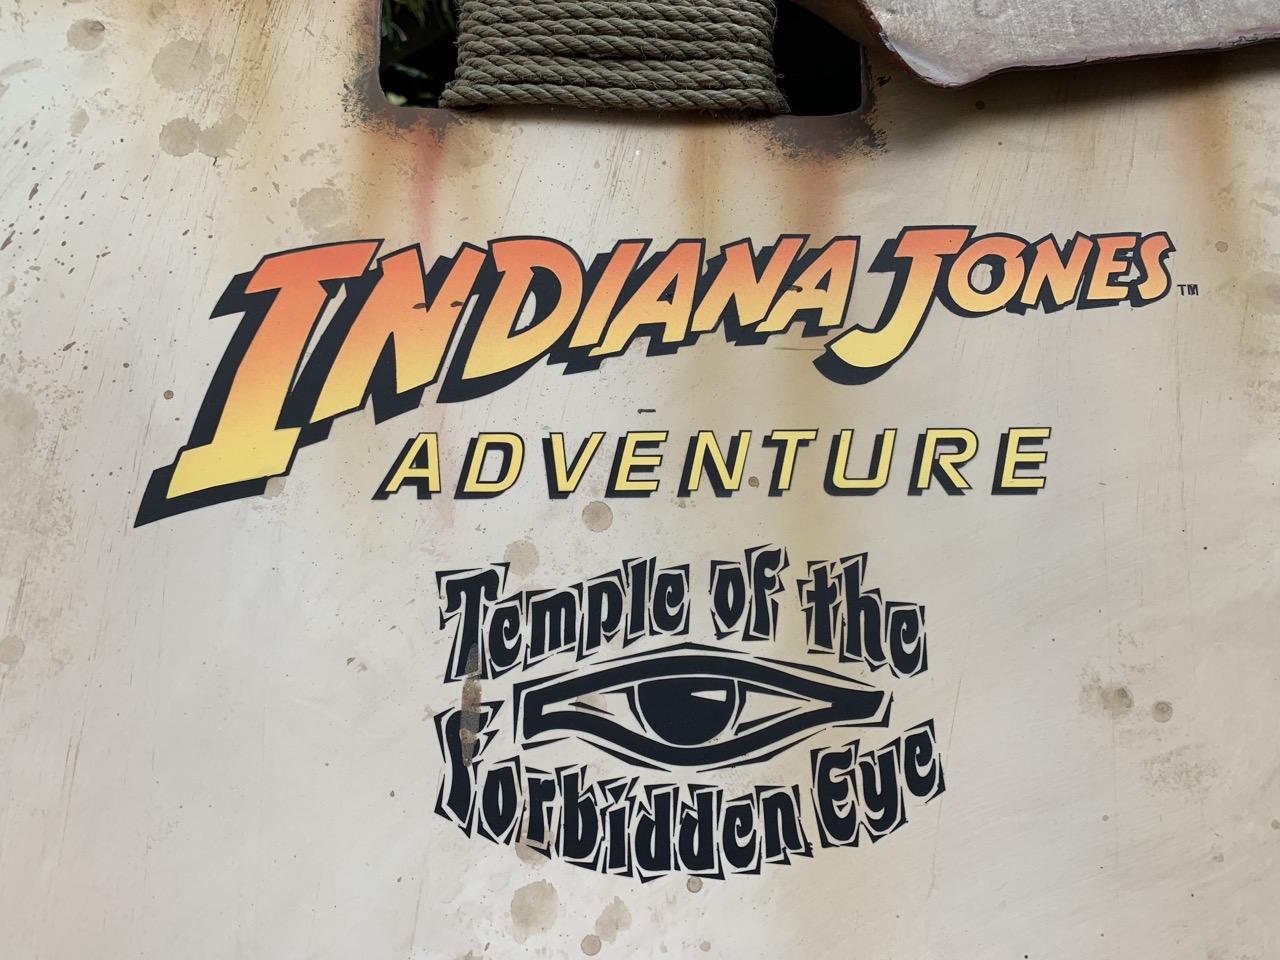 best disney rides in the world indiana jones adventure.jpeg